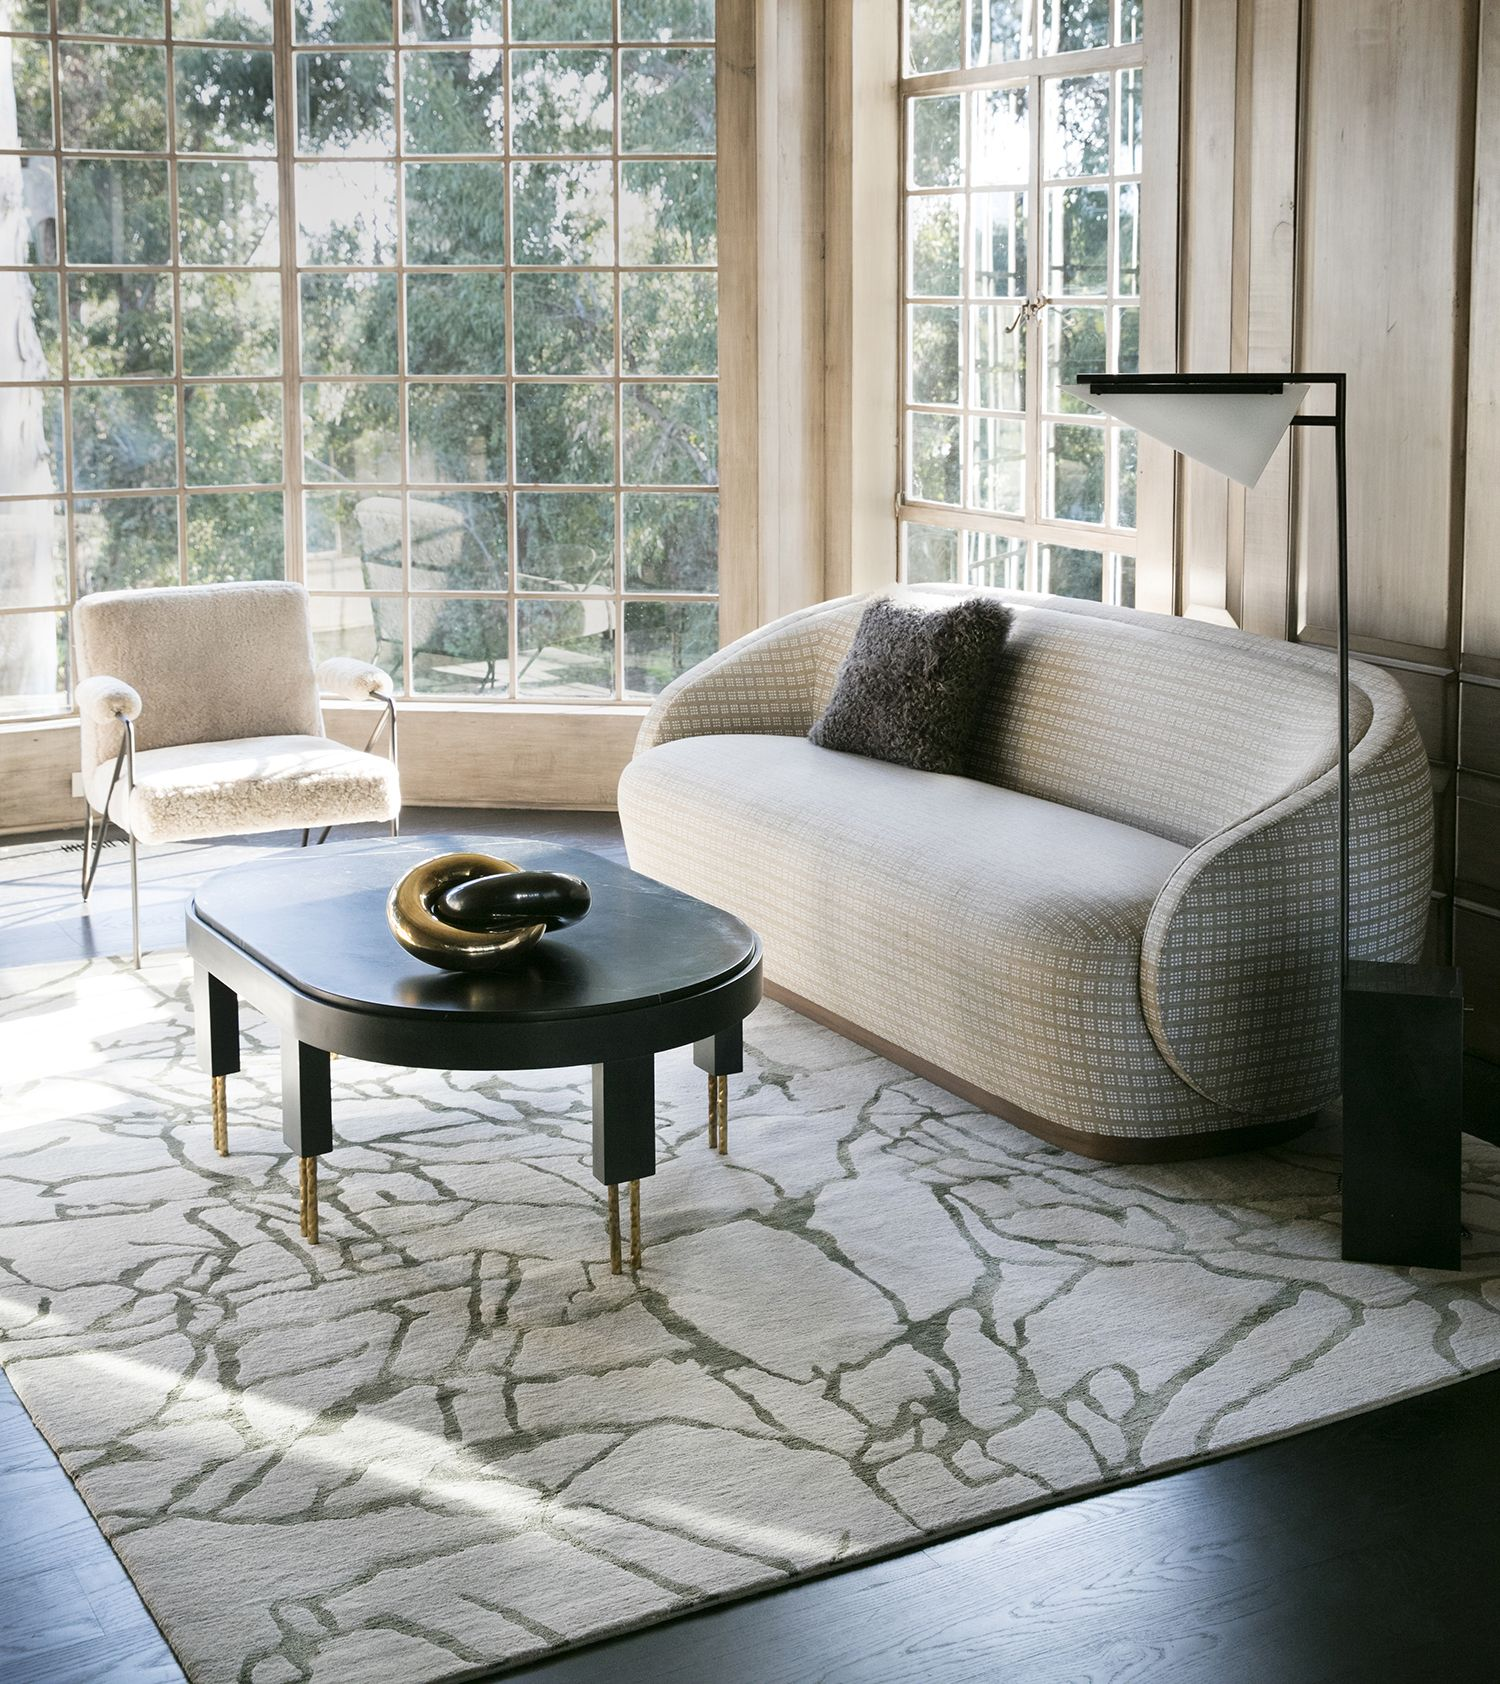 Forma Floor Lamp 客厅 Flooring Floor Lamp Kelly Wearstler